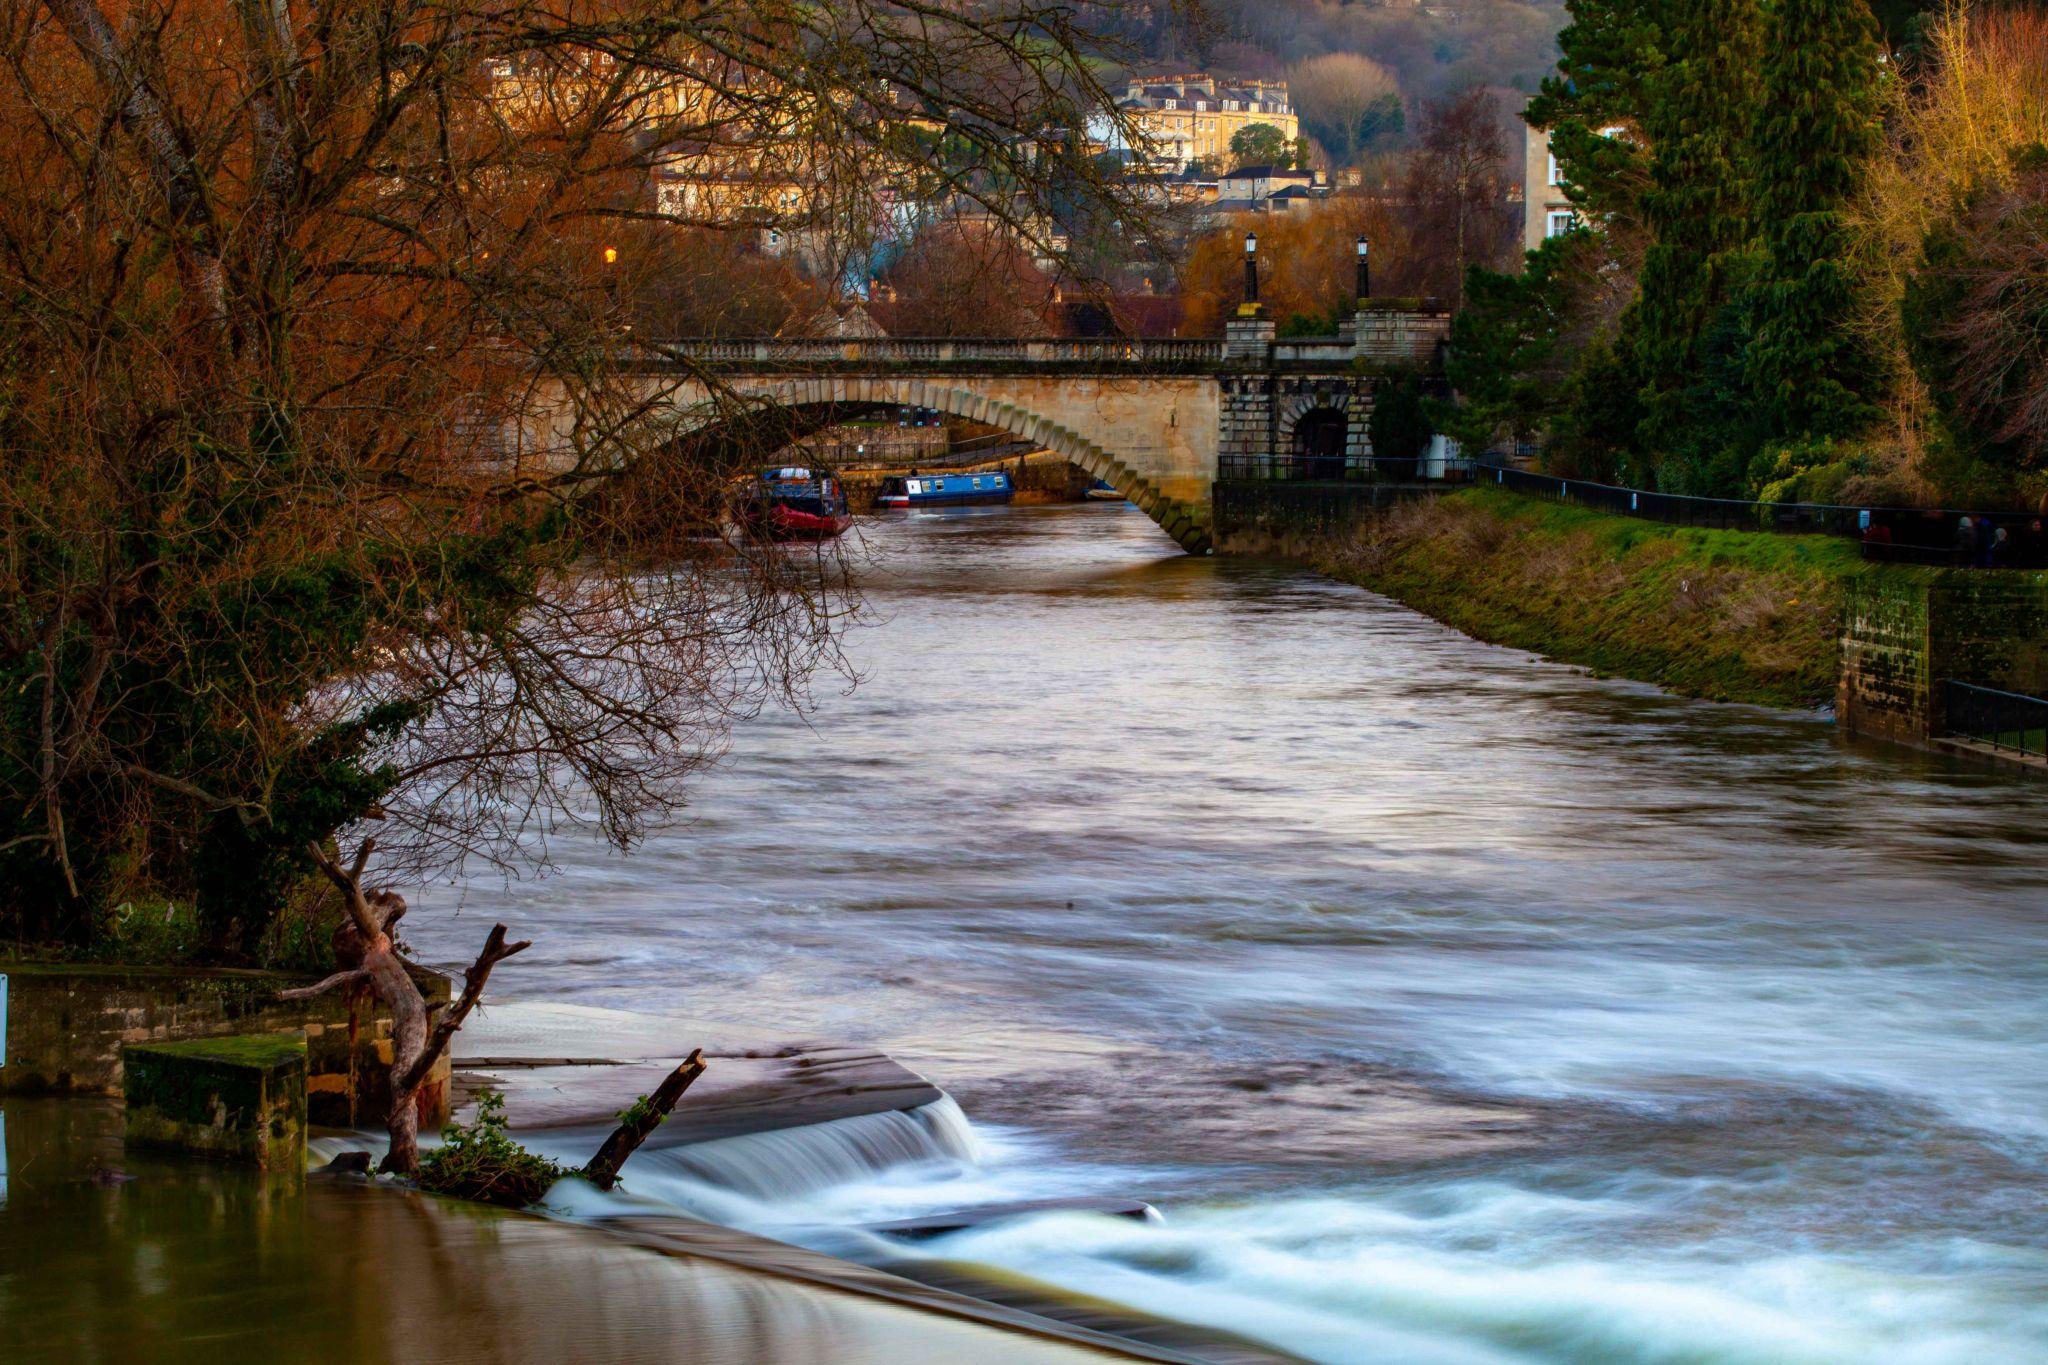 Cleveland Bridge, Avon River, Bath, England, United Kingdom